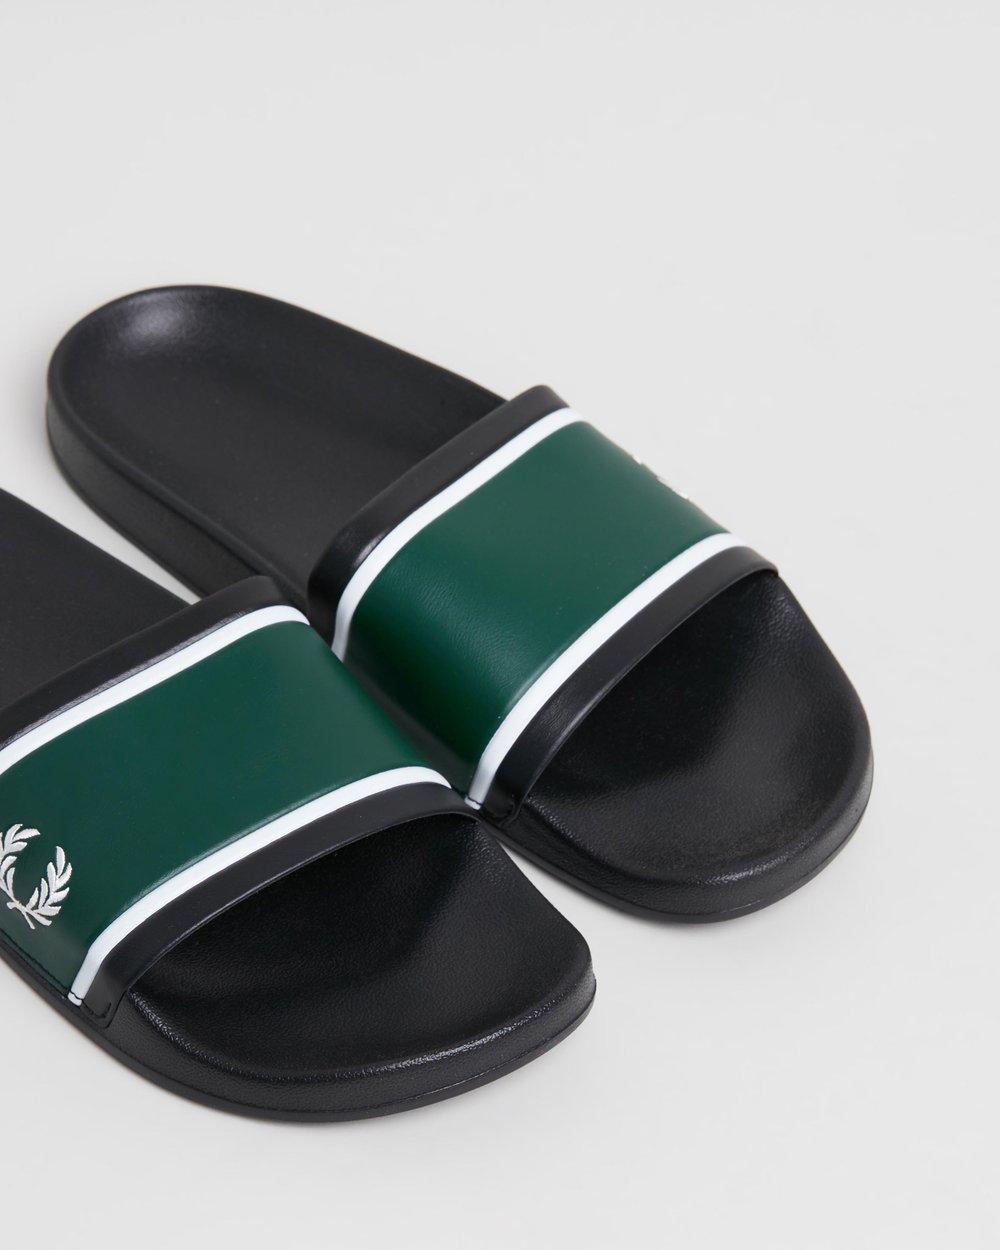 2cb2f8c0256a Debossed Branding Sliders - Men s by Fred Perry Online